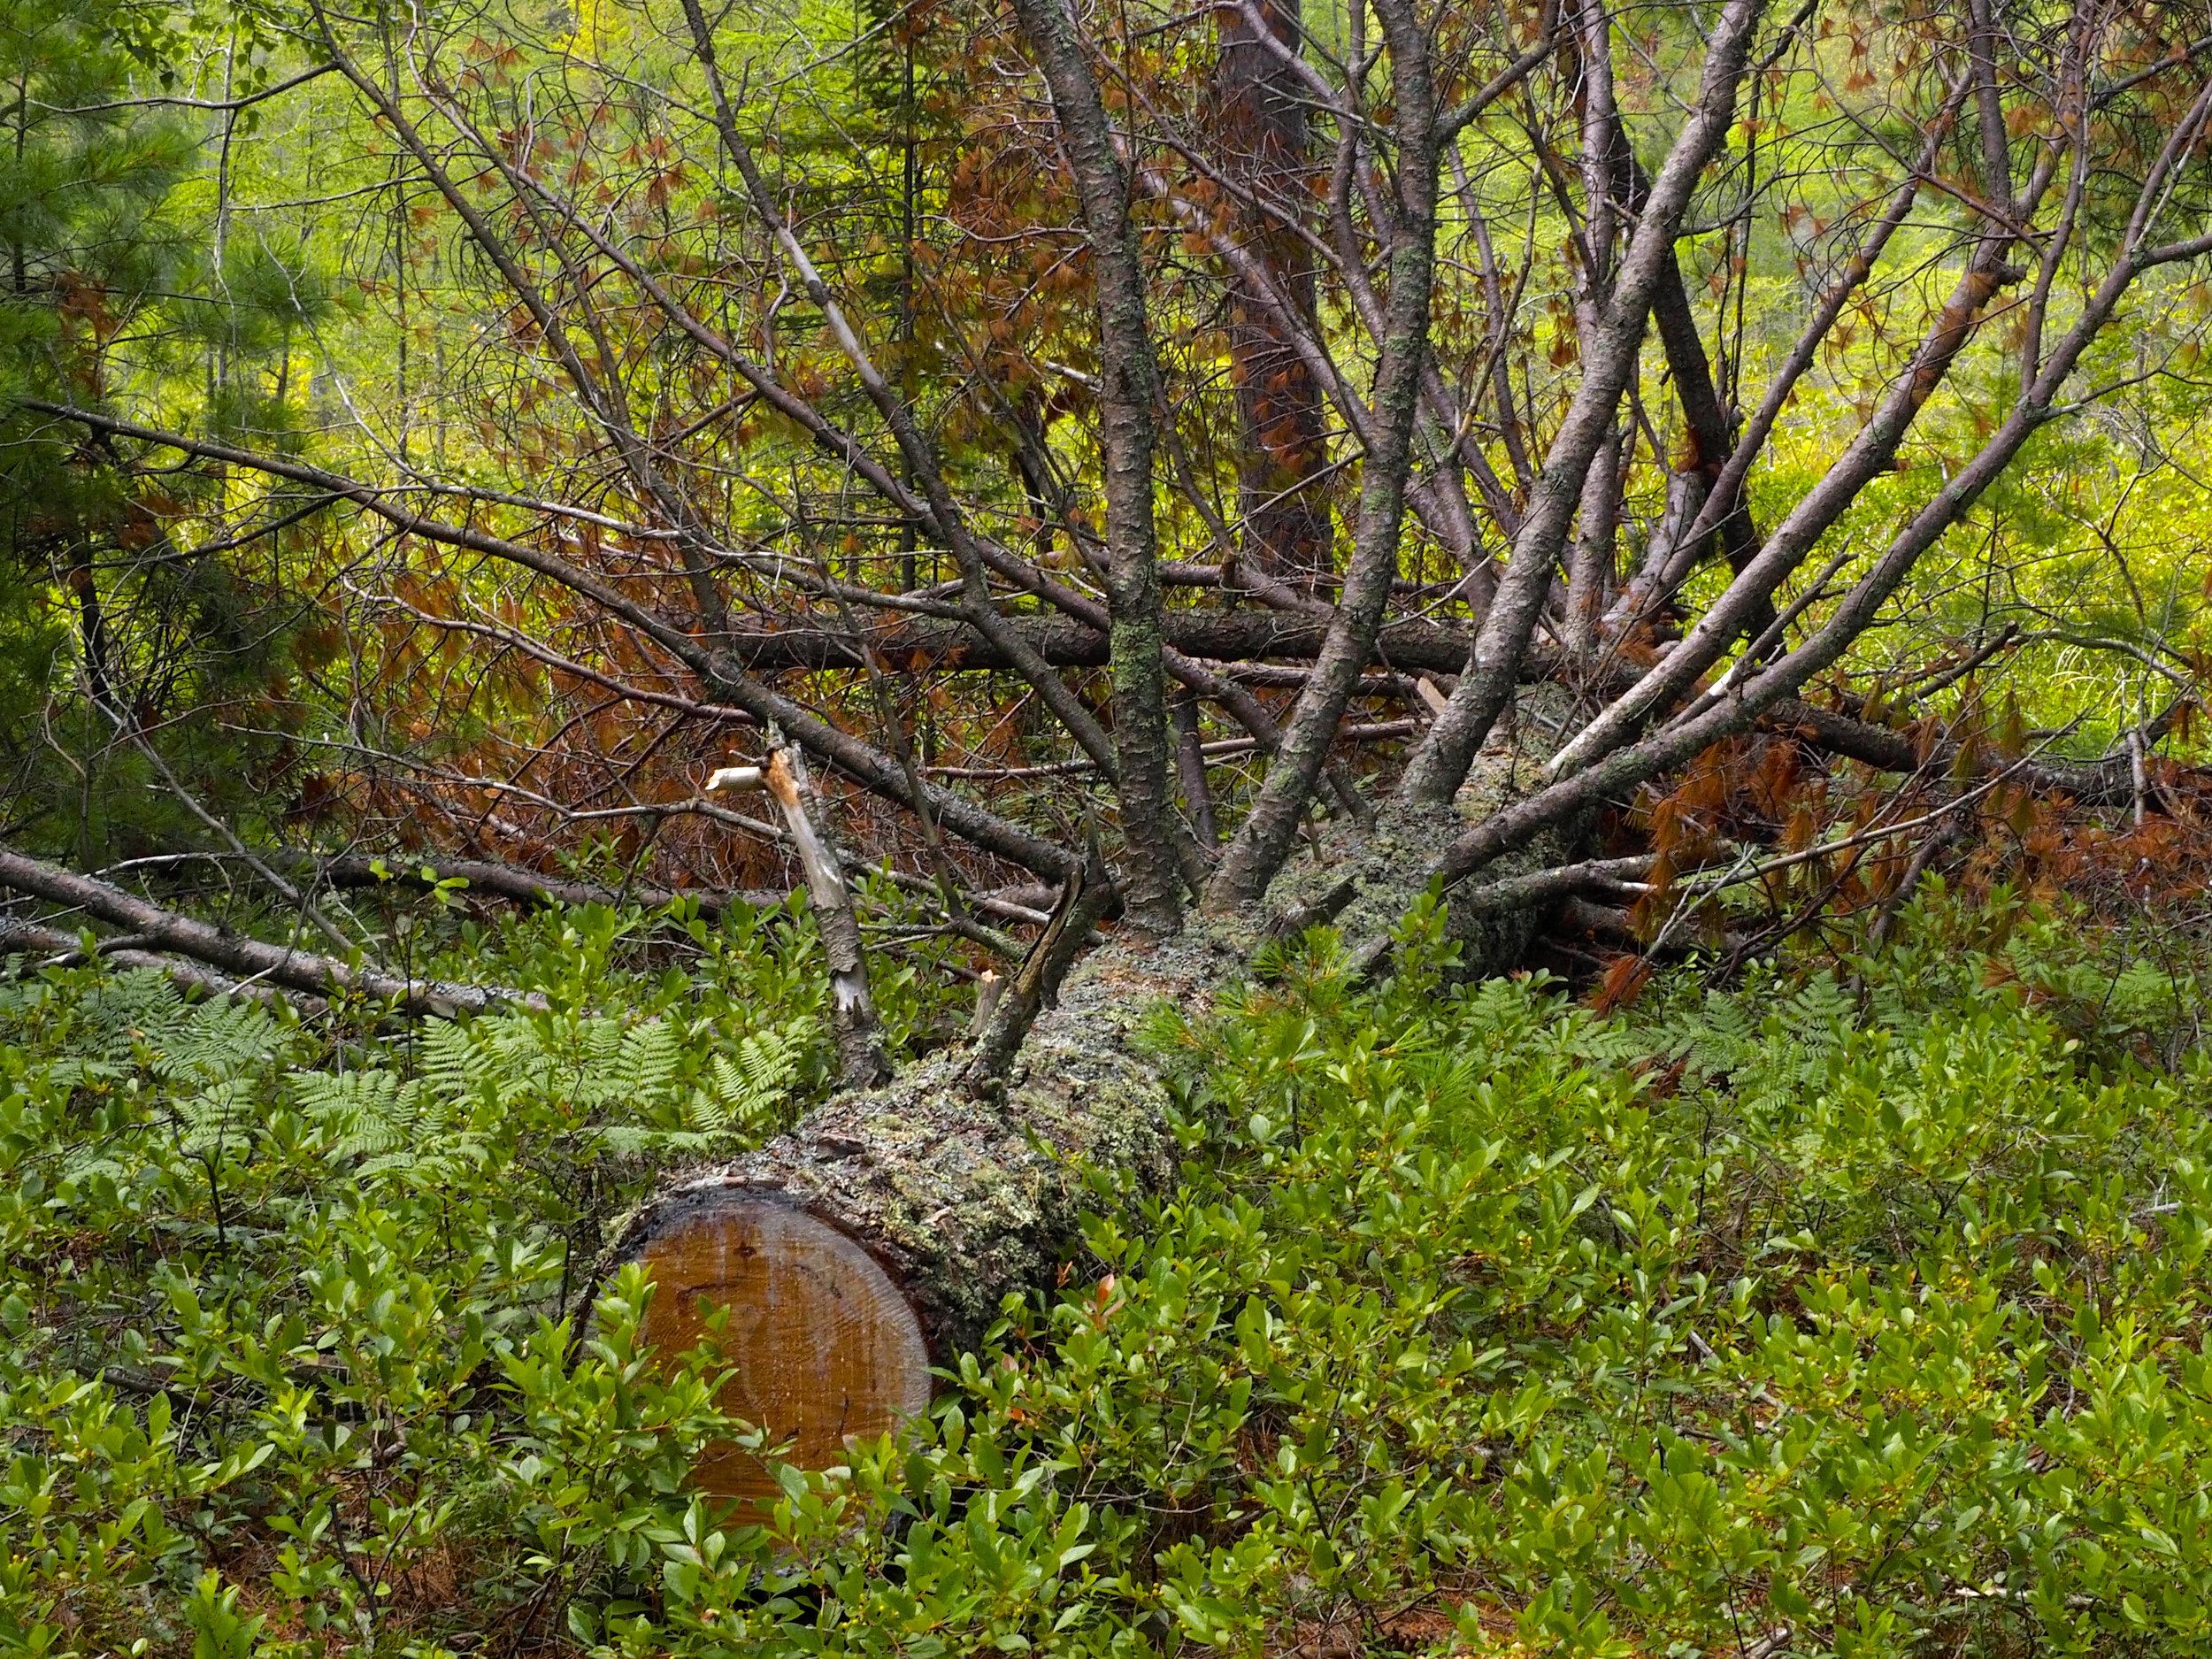 cindi_Madeline_NationalForest_Bog_spiritedtable_photo05.jpg